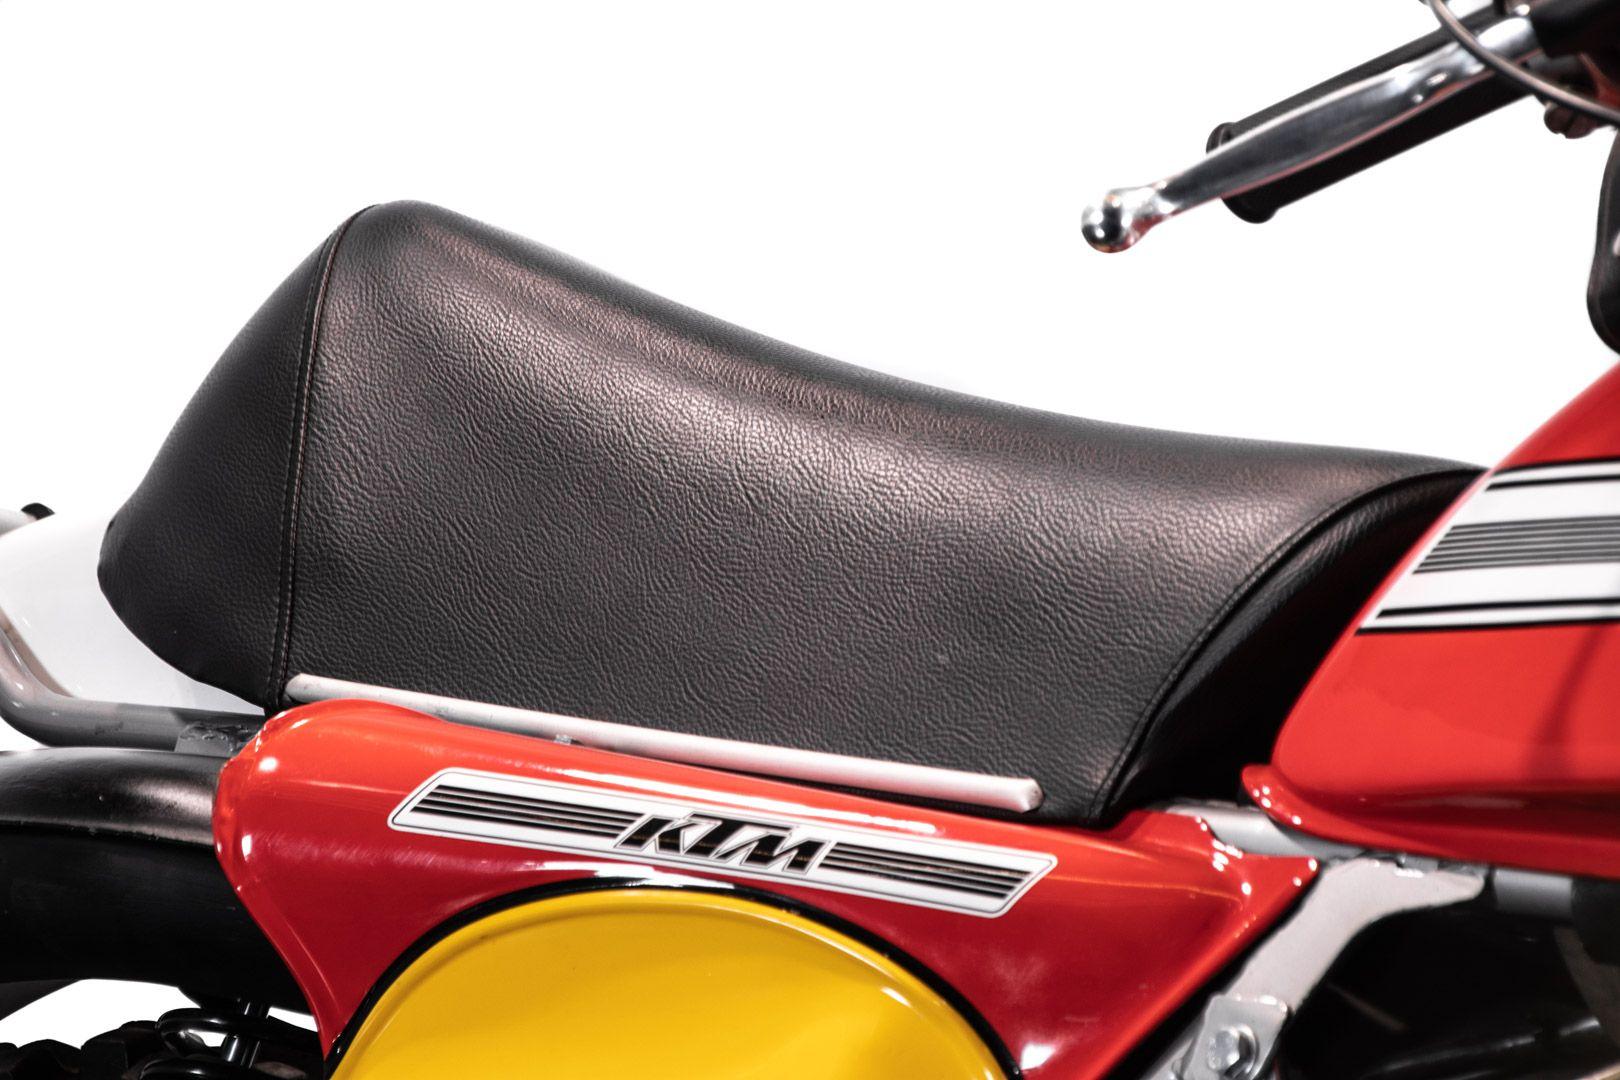 1976 KTM GS 250 84002